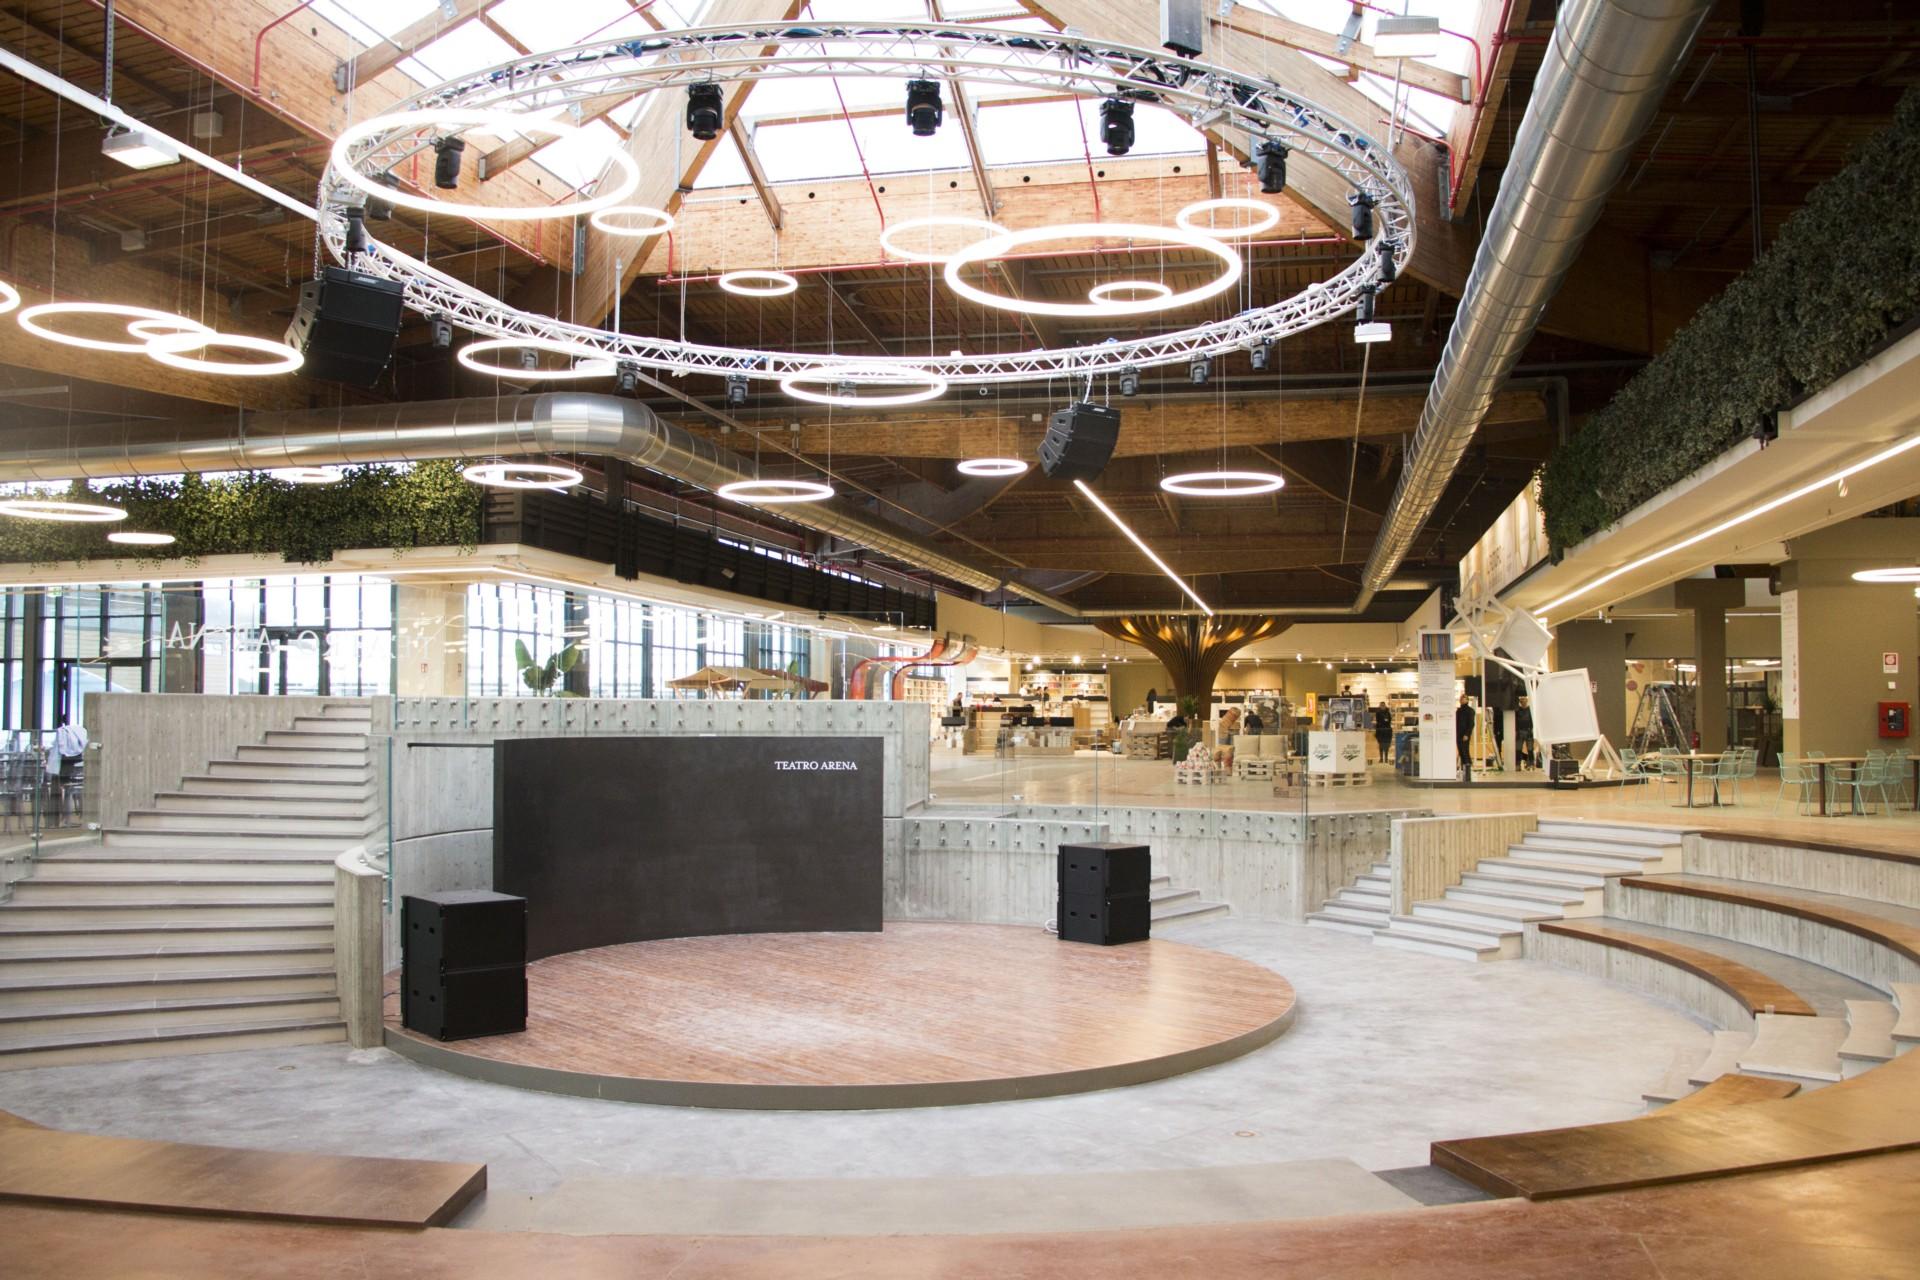 FICO, Fondazione Feltrinelli & Microsoft House, parmi les gagnants des MIPIM Awards 2018